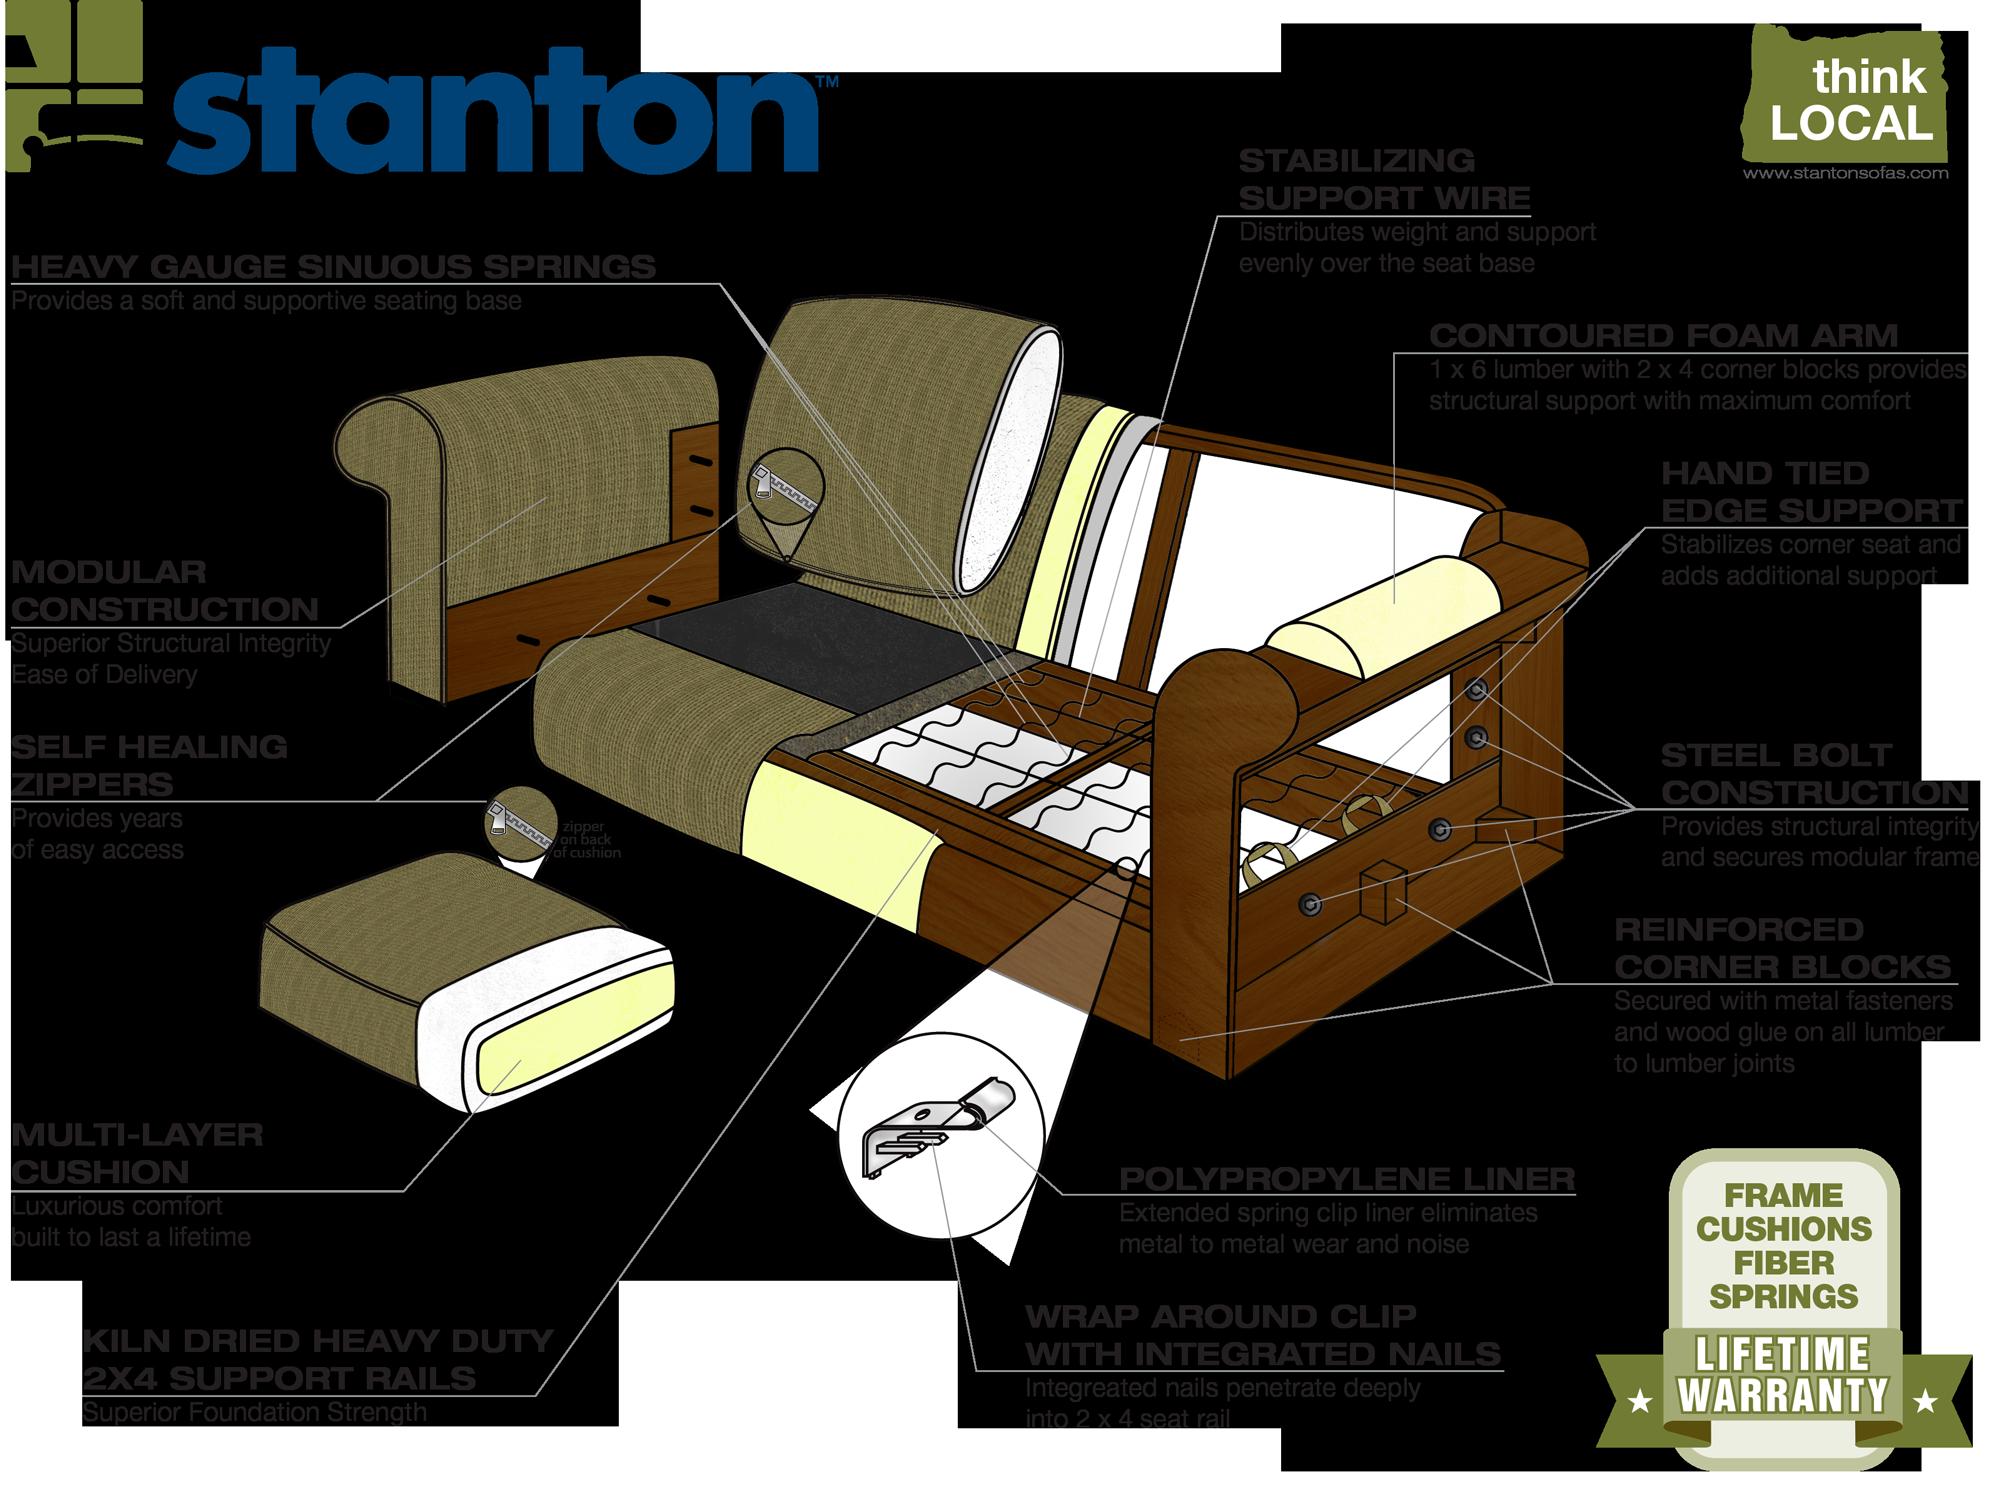 Prime Bradleys Furniture Etc Stanton Fabric And Leather Sofas Interior Design Ideas Clesiryabchikinfo